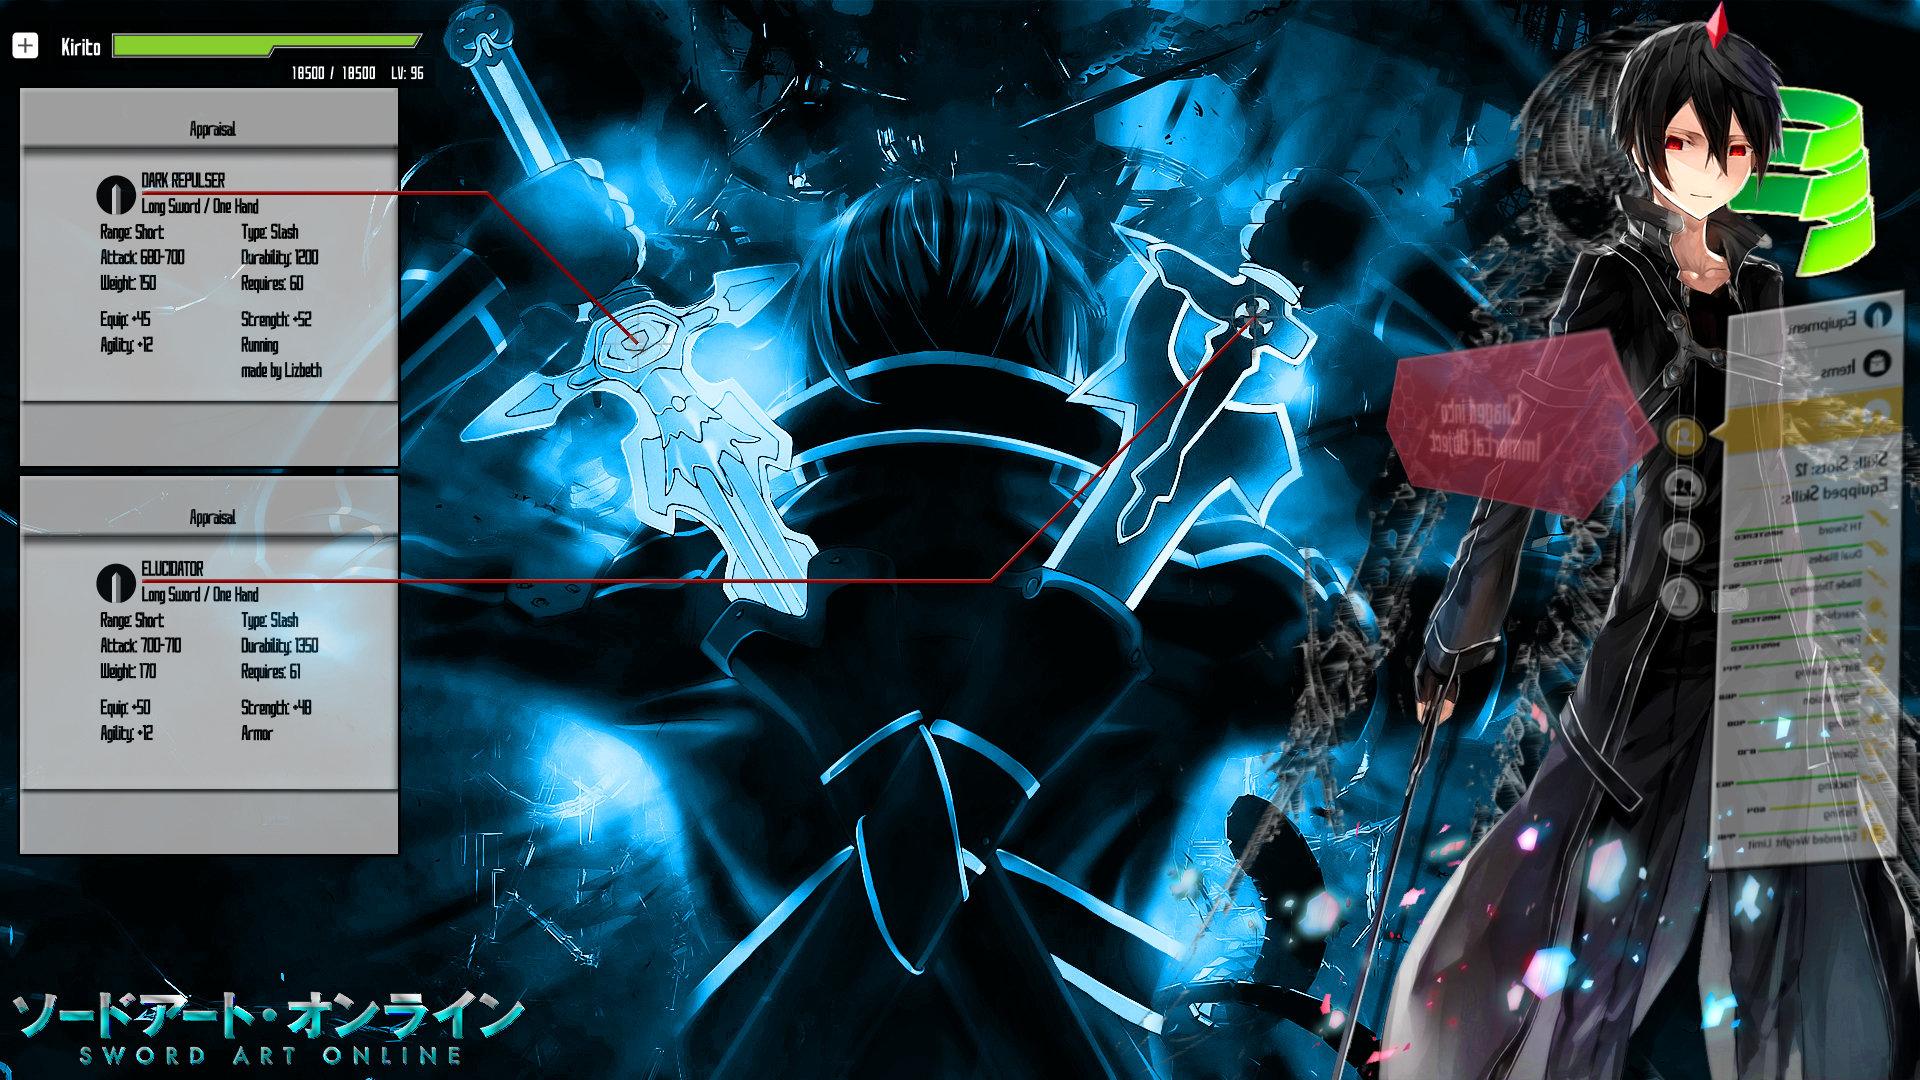 Sword Art Online Aincrad 100th Floor Last Boss By Nanayaemiya